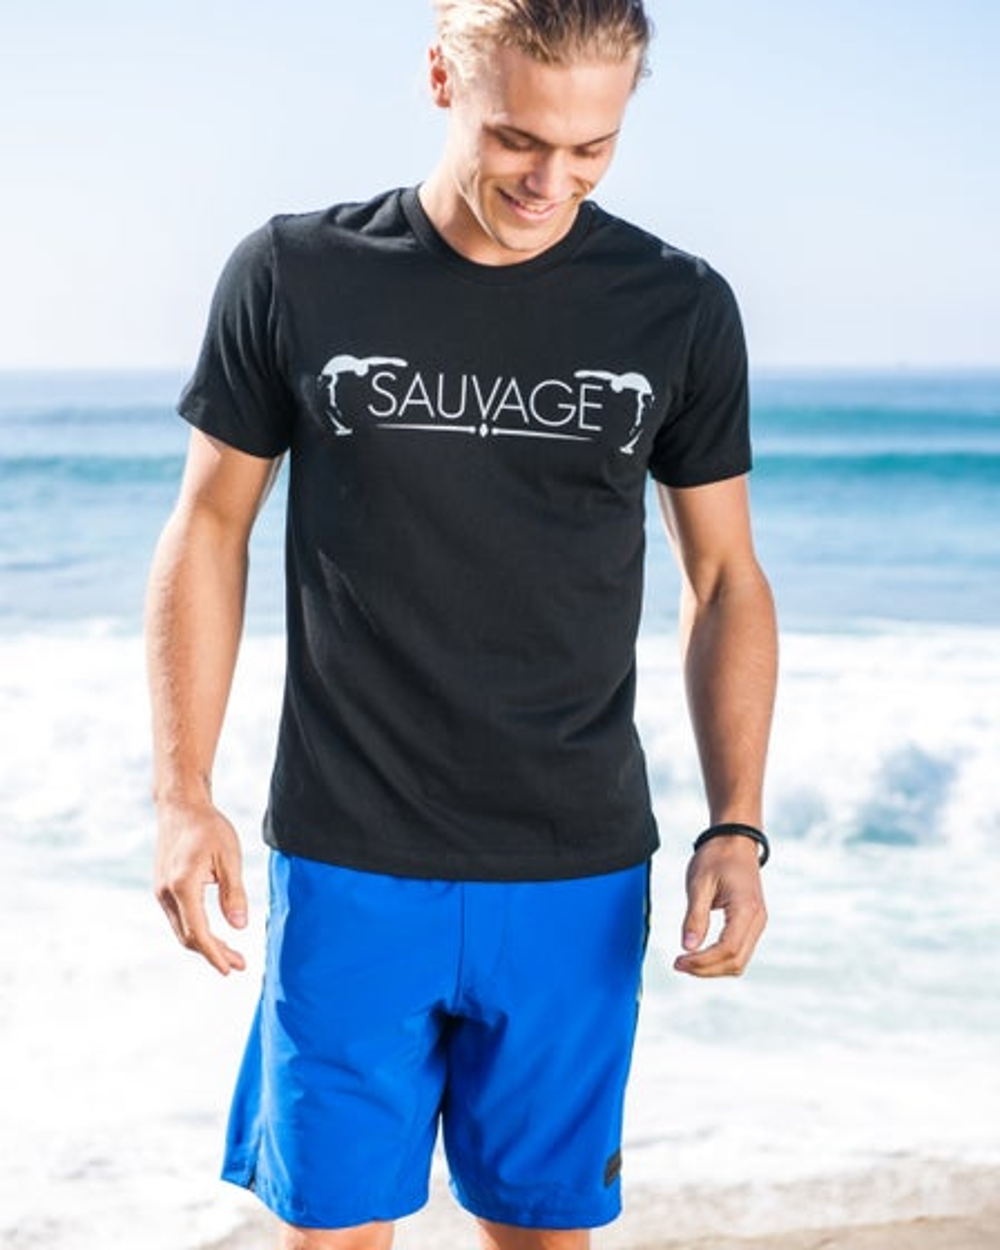 2015 Sauvage Active Men's Tabu Crew Neck T-Shirt